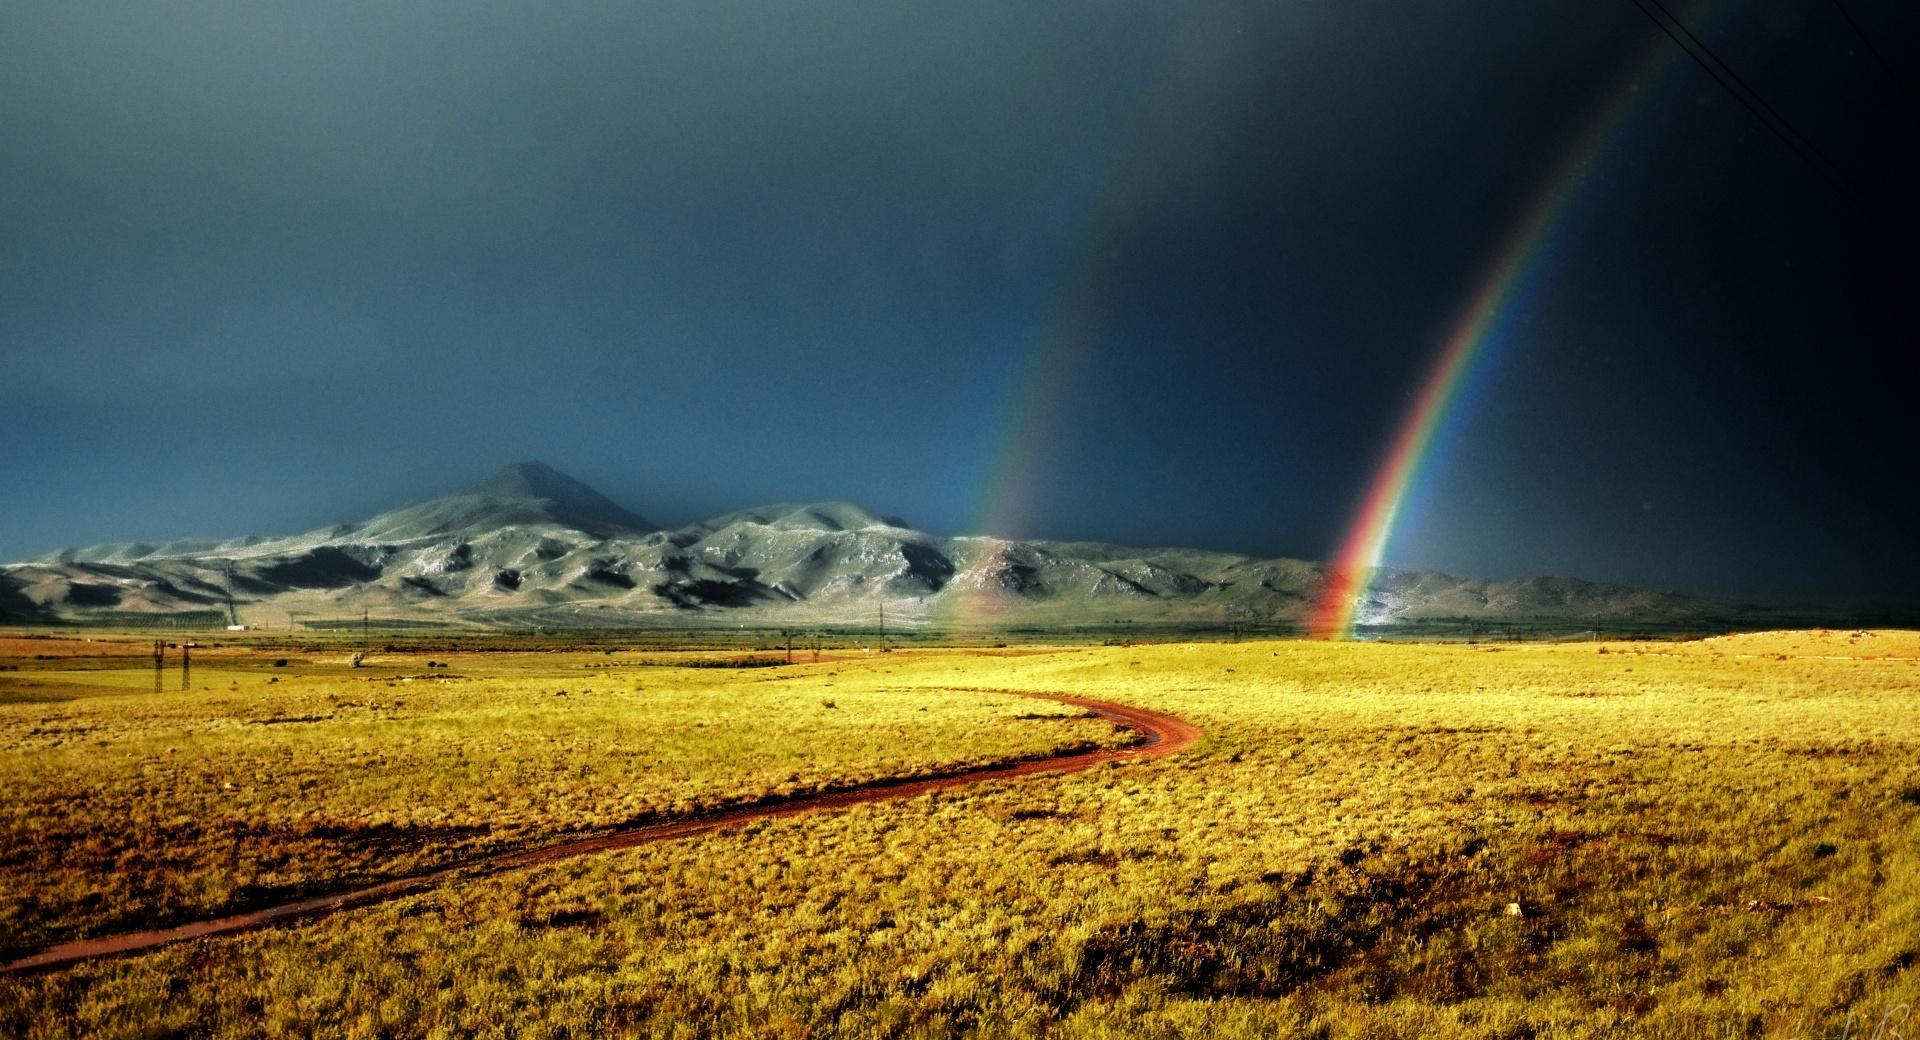 Armenia Rainbow wallpapers HD quality